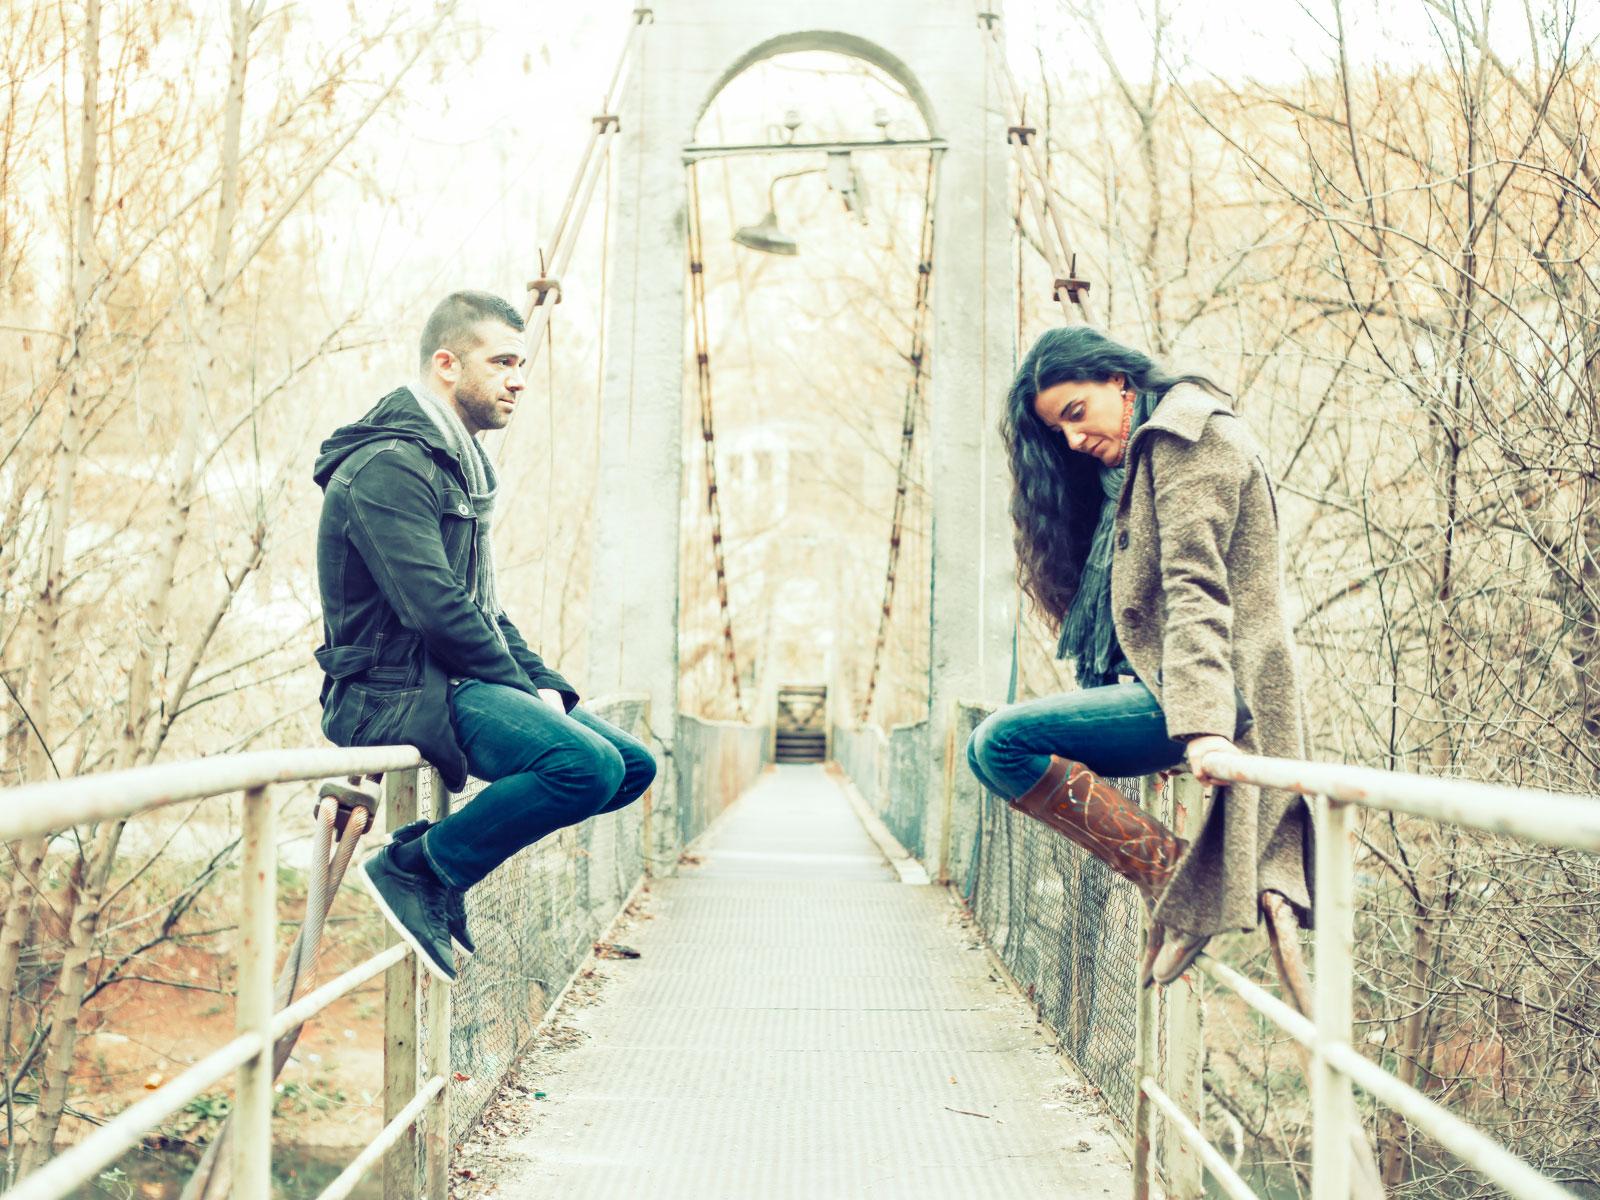 como-identificar-diferenca-entre-gestos-de-amor-e-carencia-afetiva